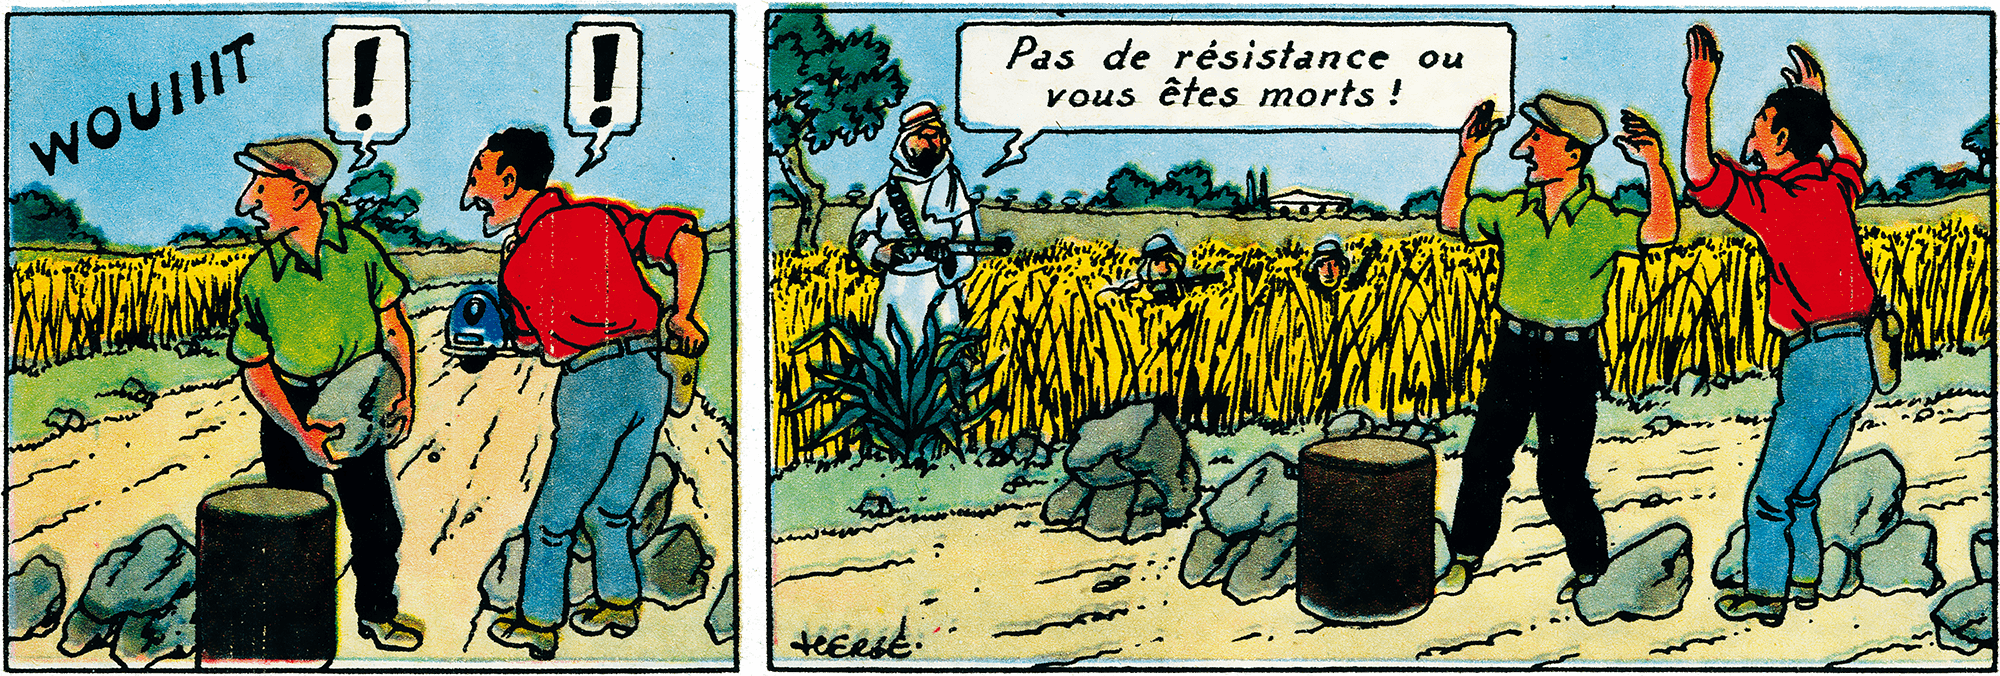 Tintin - The Adventures of Tintin - Land of Black Gold - Tintin magazine